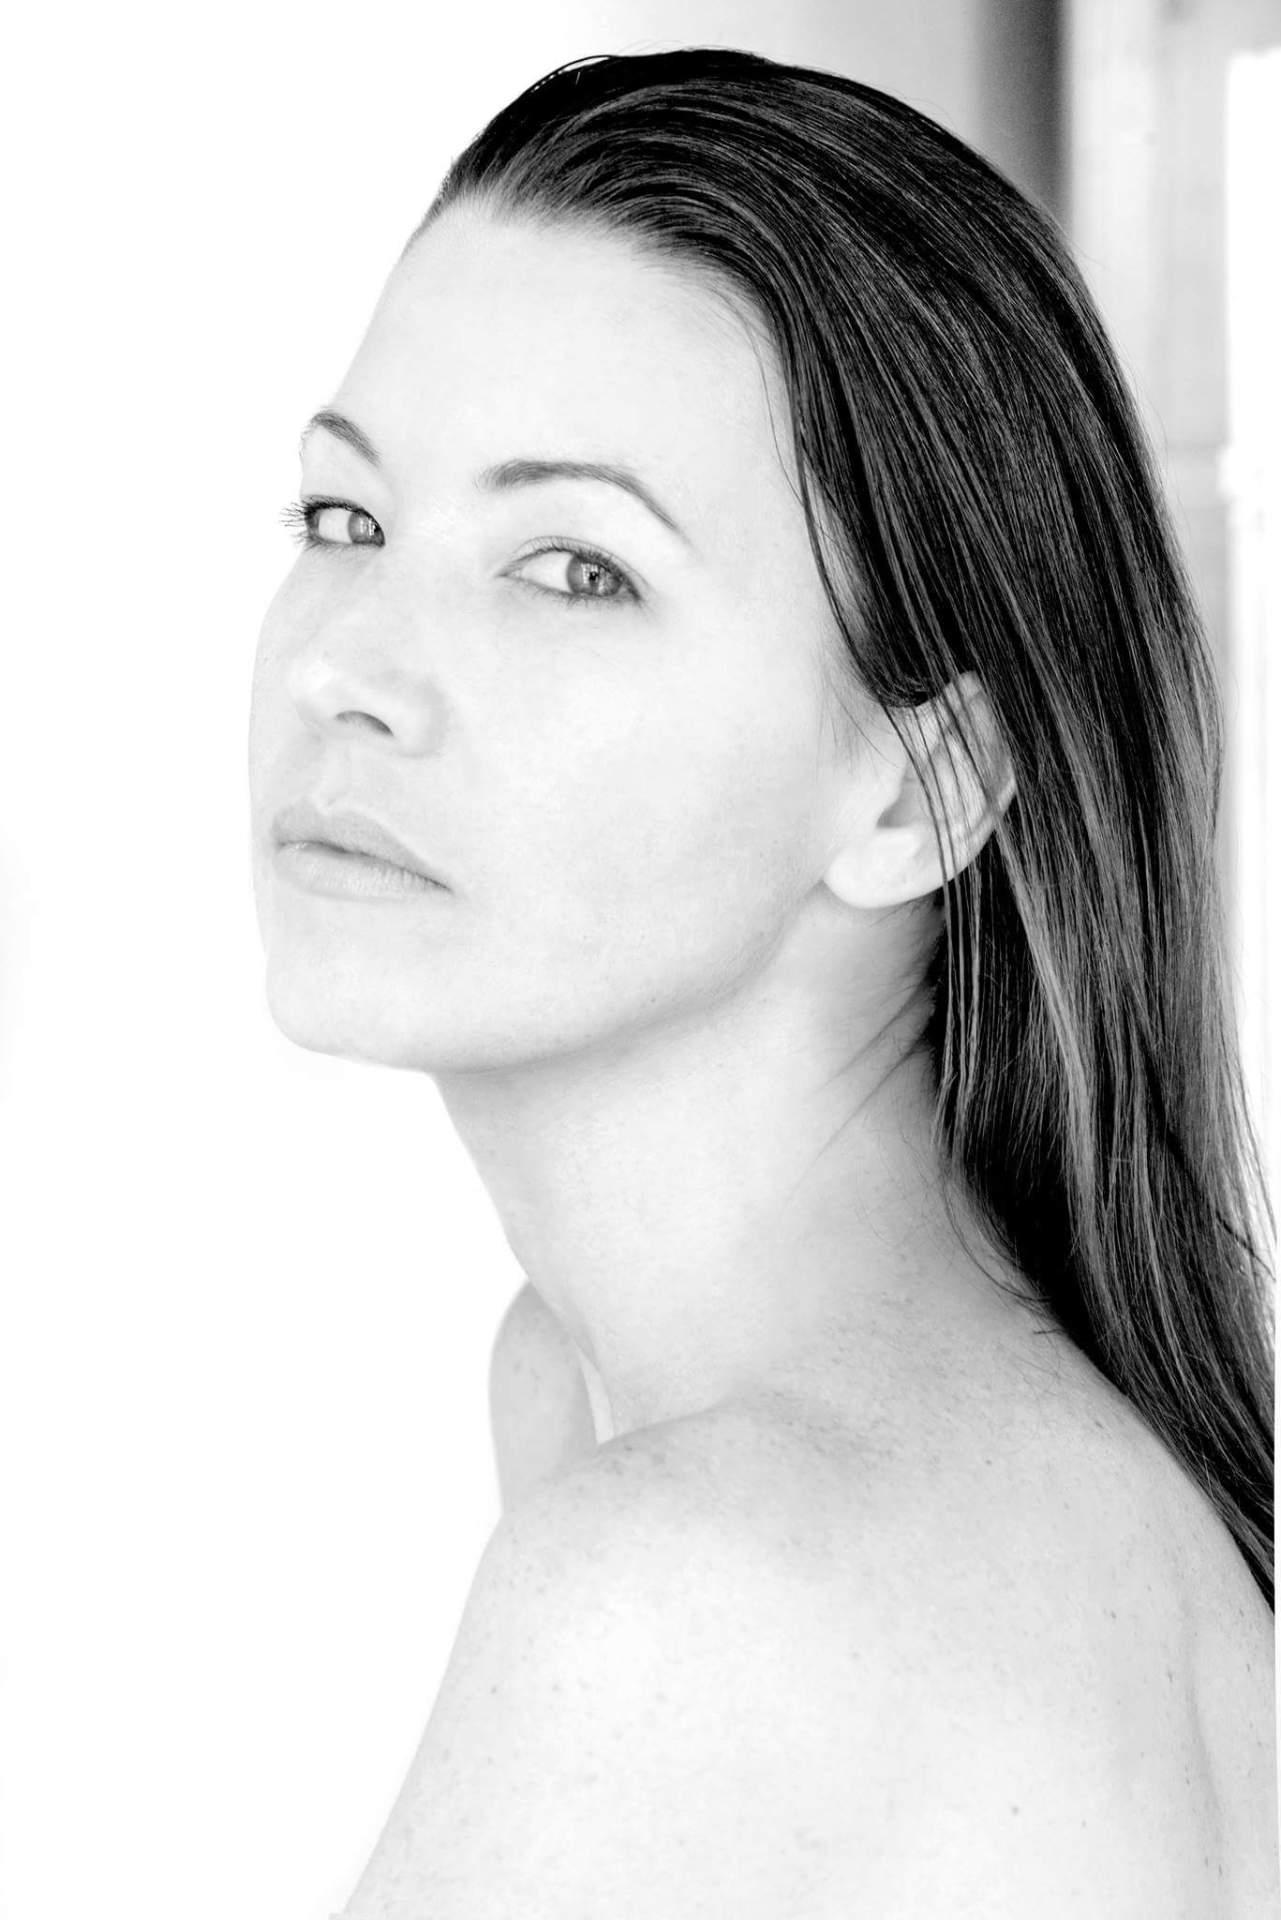 Andrea Dawn Shelley